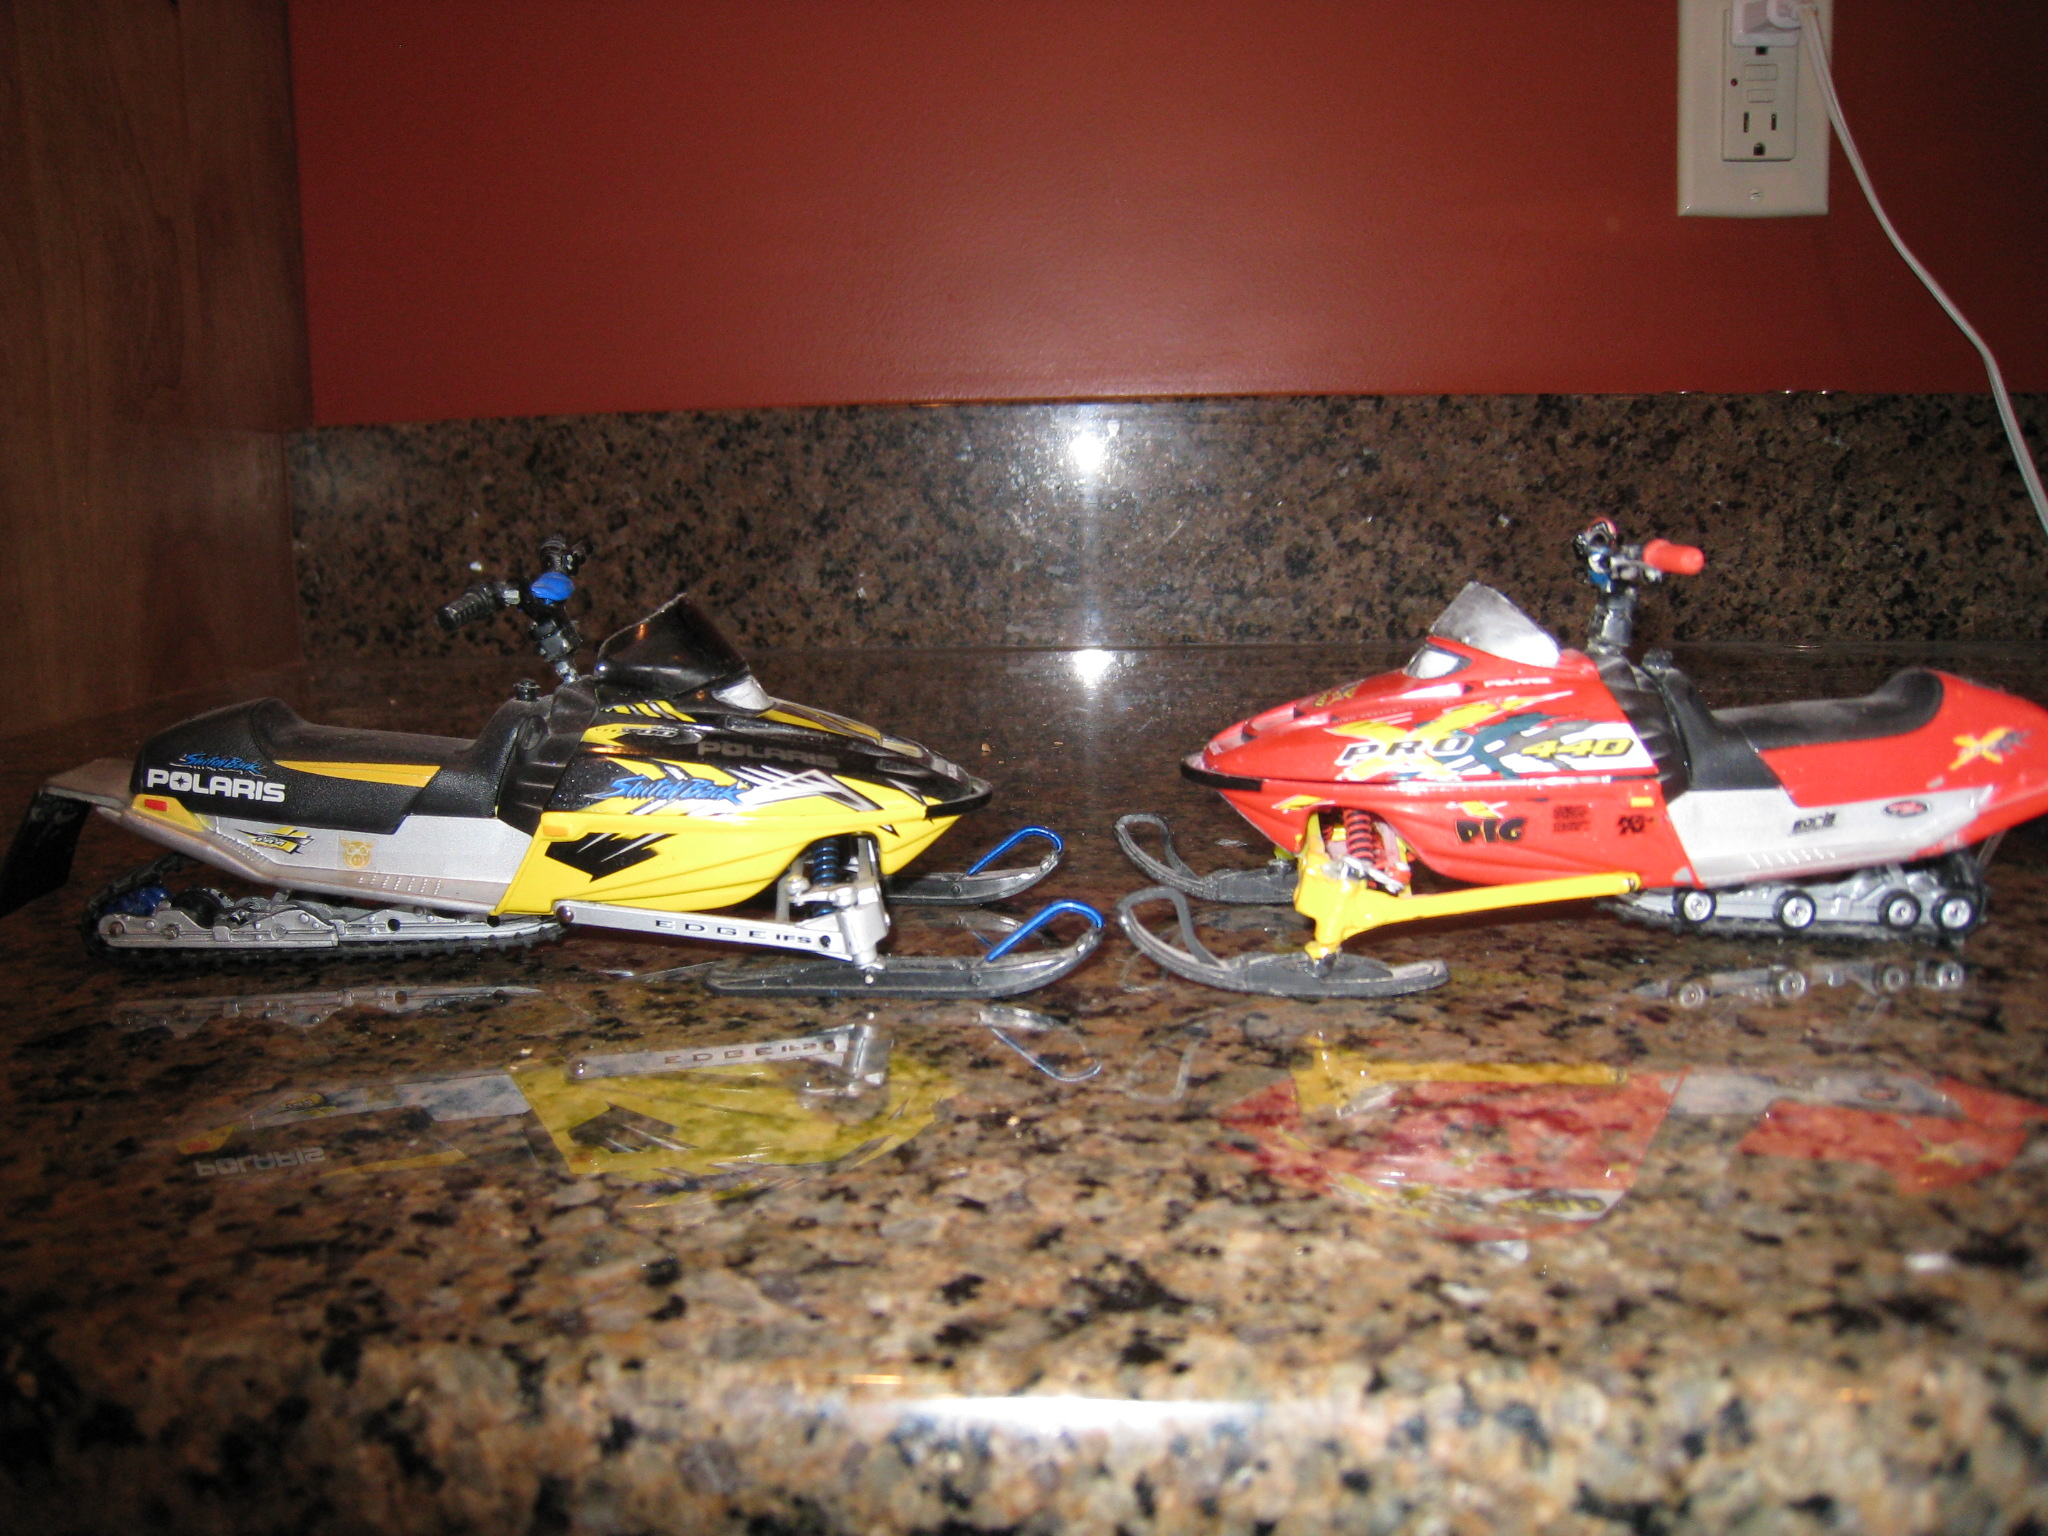 Toy  Diecast Snowmobiles